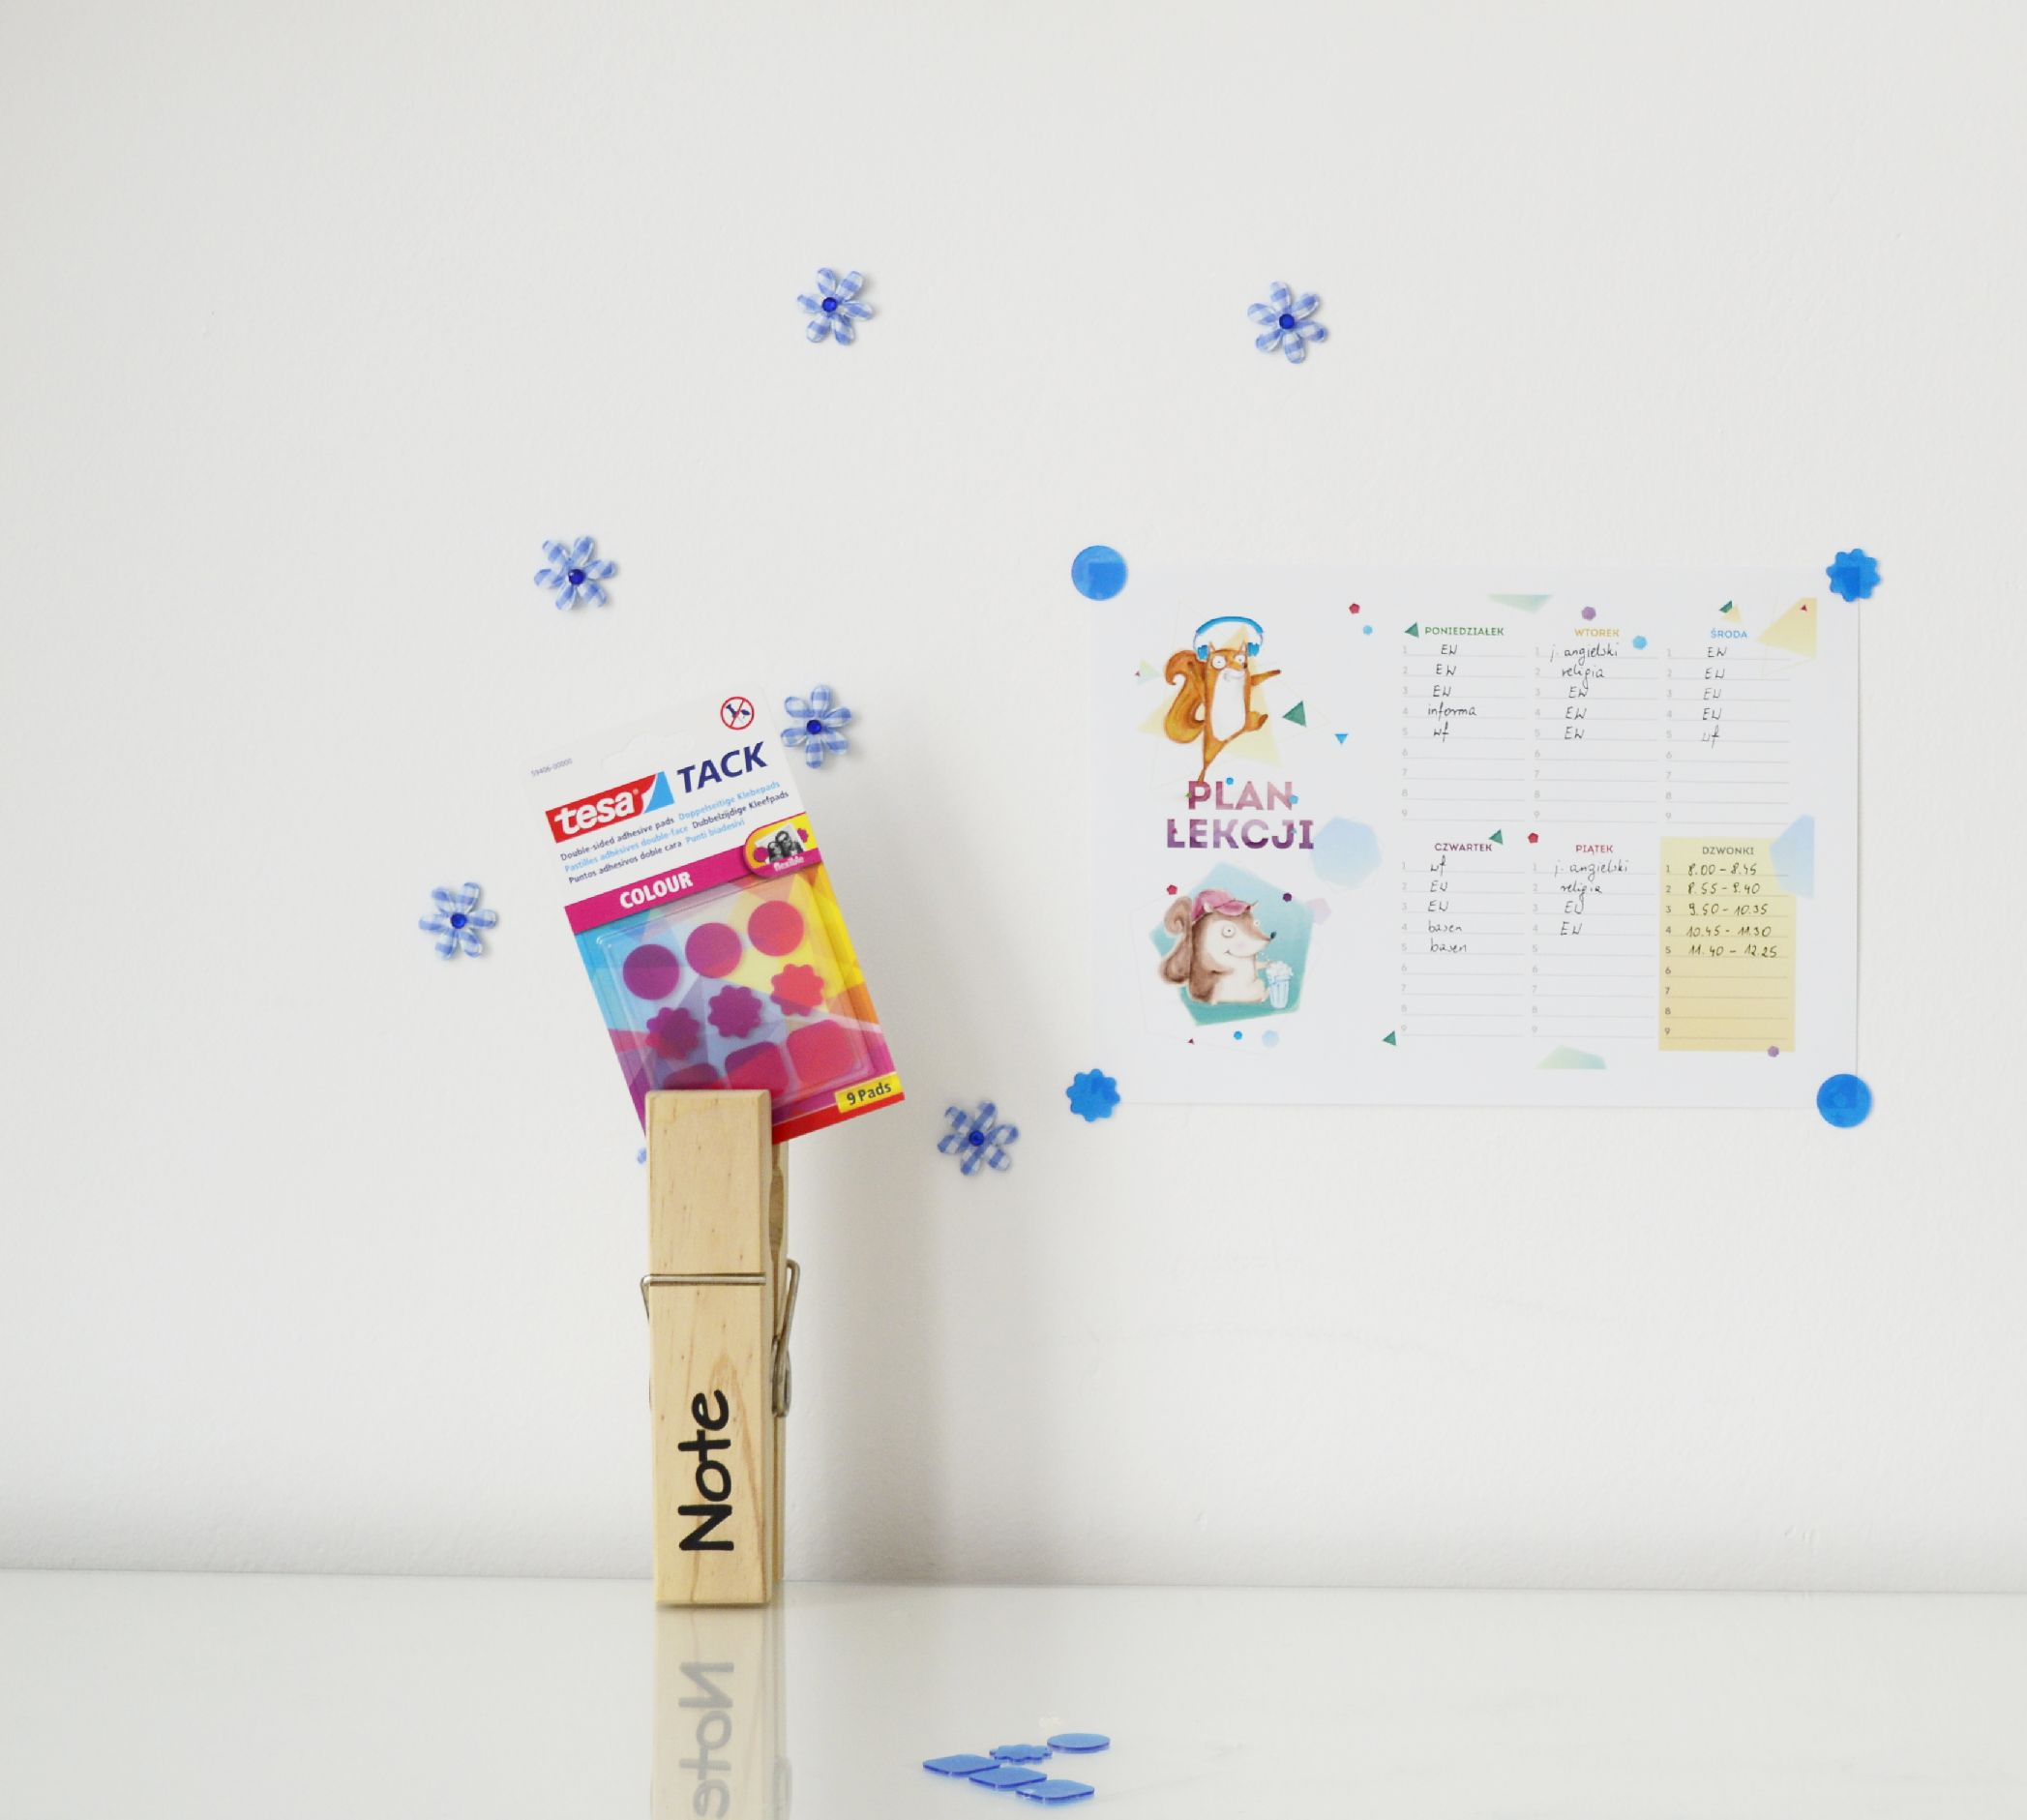 Plan lekcji mocowany na niebieski płatek tesa TACK